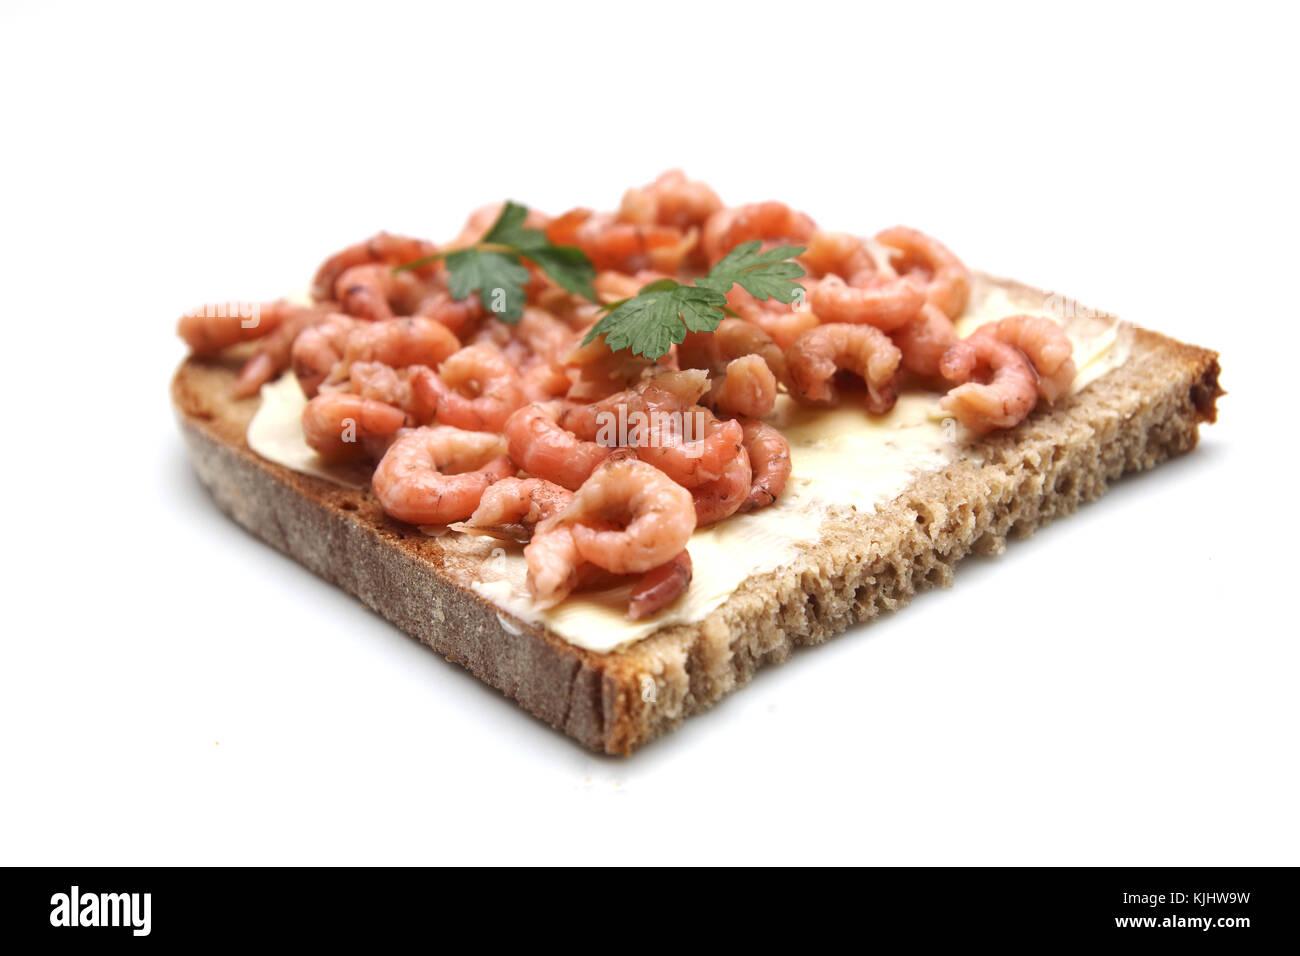 Krabbenbrot mit Salzbutter - Stock Image